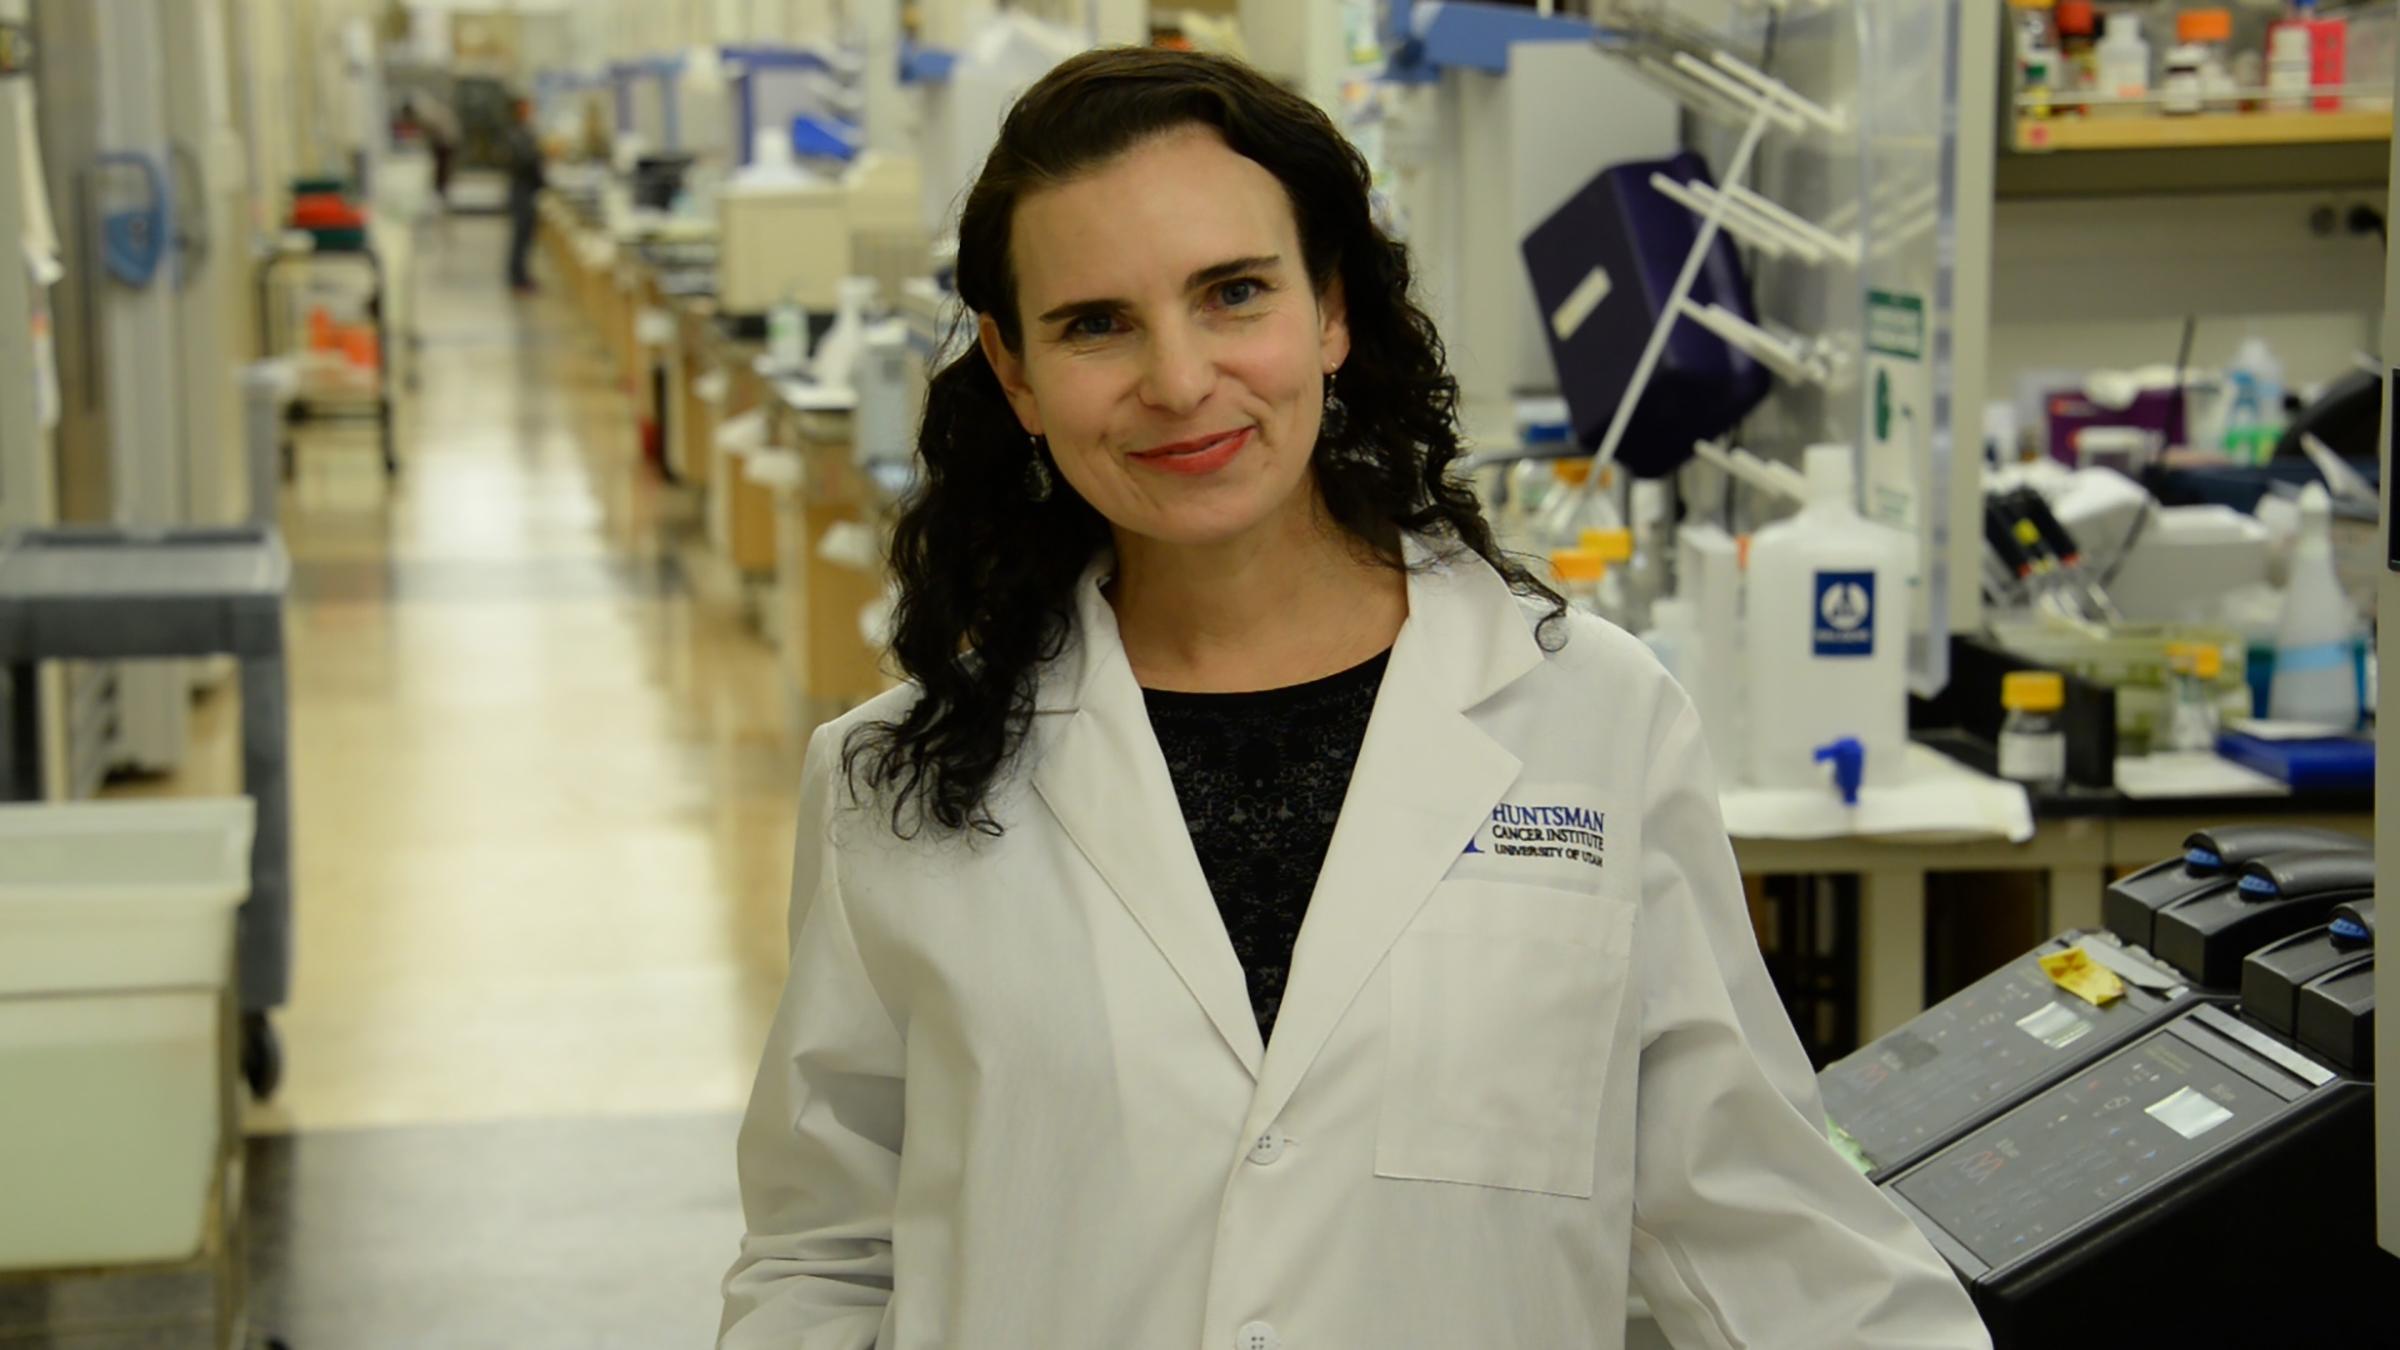 Jody Rosenblatt, Ph.D., associate professor of oncological sciences at the University of Utah School of Medicine and Huntsman Cancer Institute investigator.